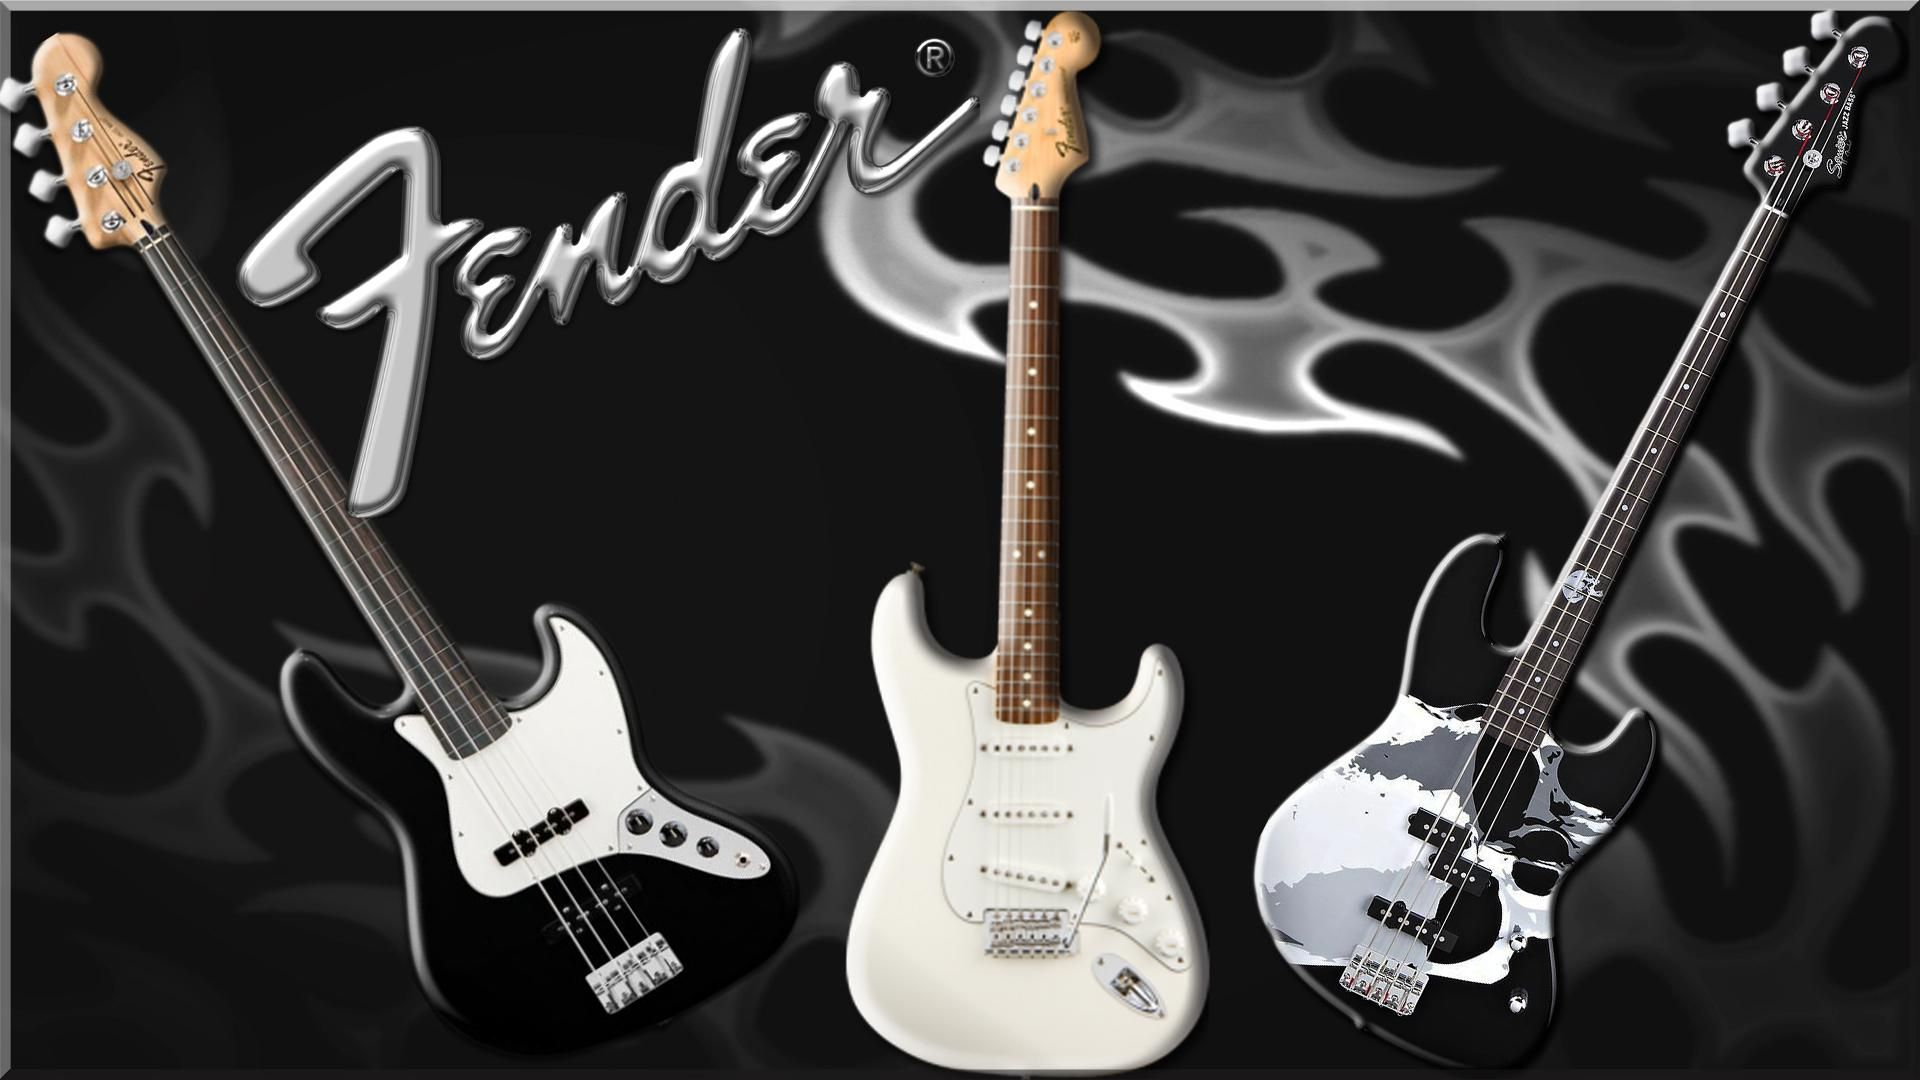 Bass Guitar Wallpaper Hd 19201200 Backgrounds 36 Wiring 101 Basic Electronics Mylespaulcom Wallpapers Adorable